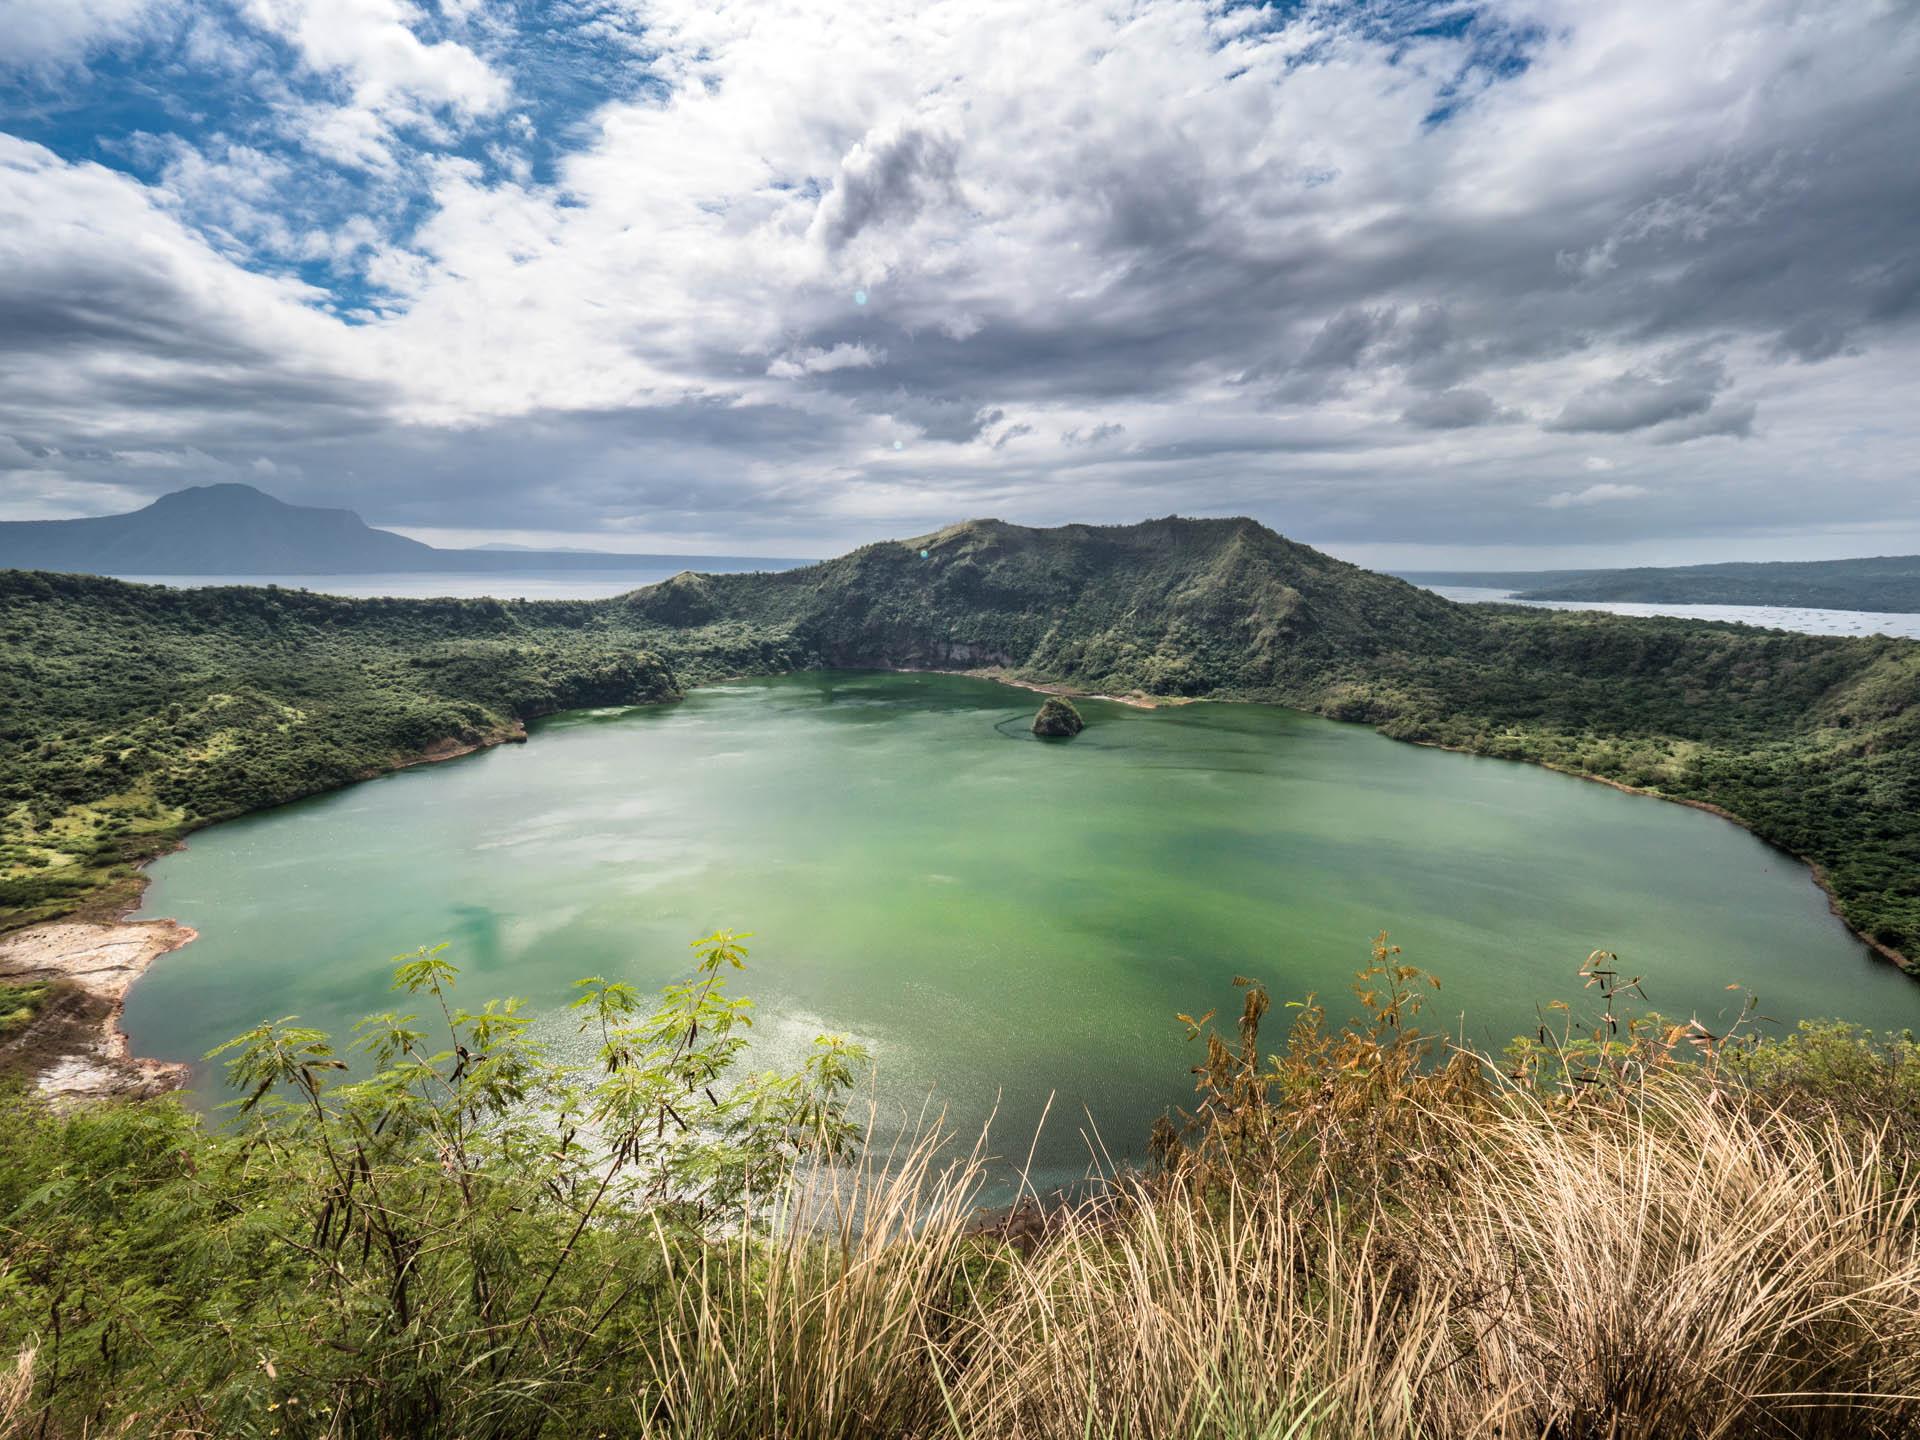 tagaytay cratere - Les globe blogueurs - blog voyage nature